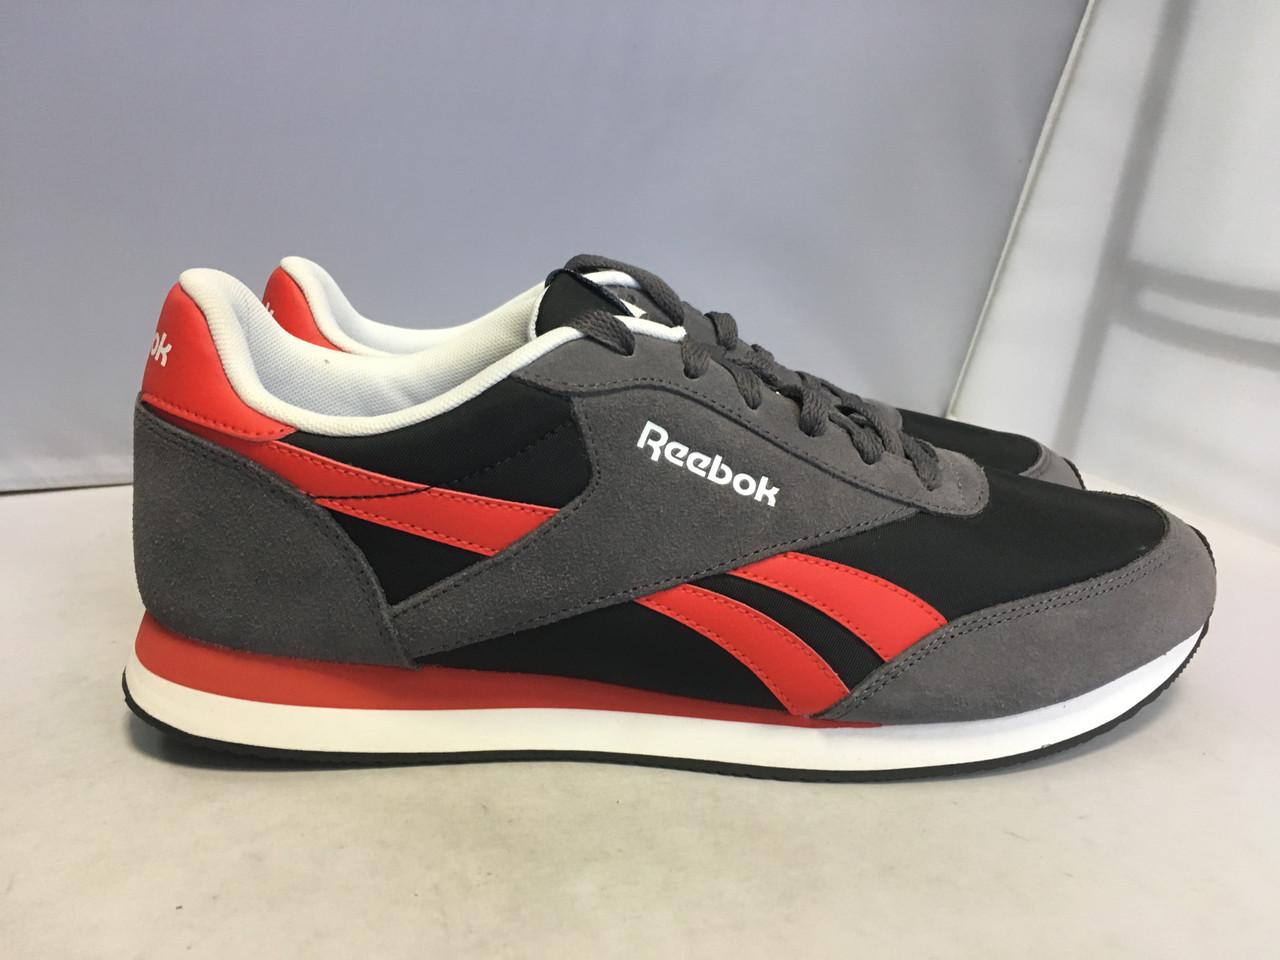 Мужские кроссовки Reebok Royal Foam Lite, 44,5 размер